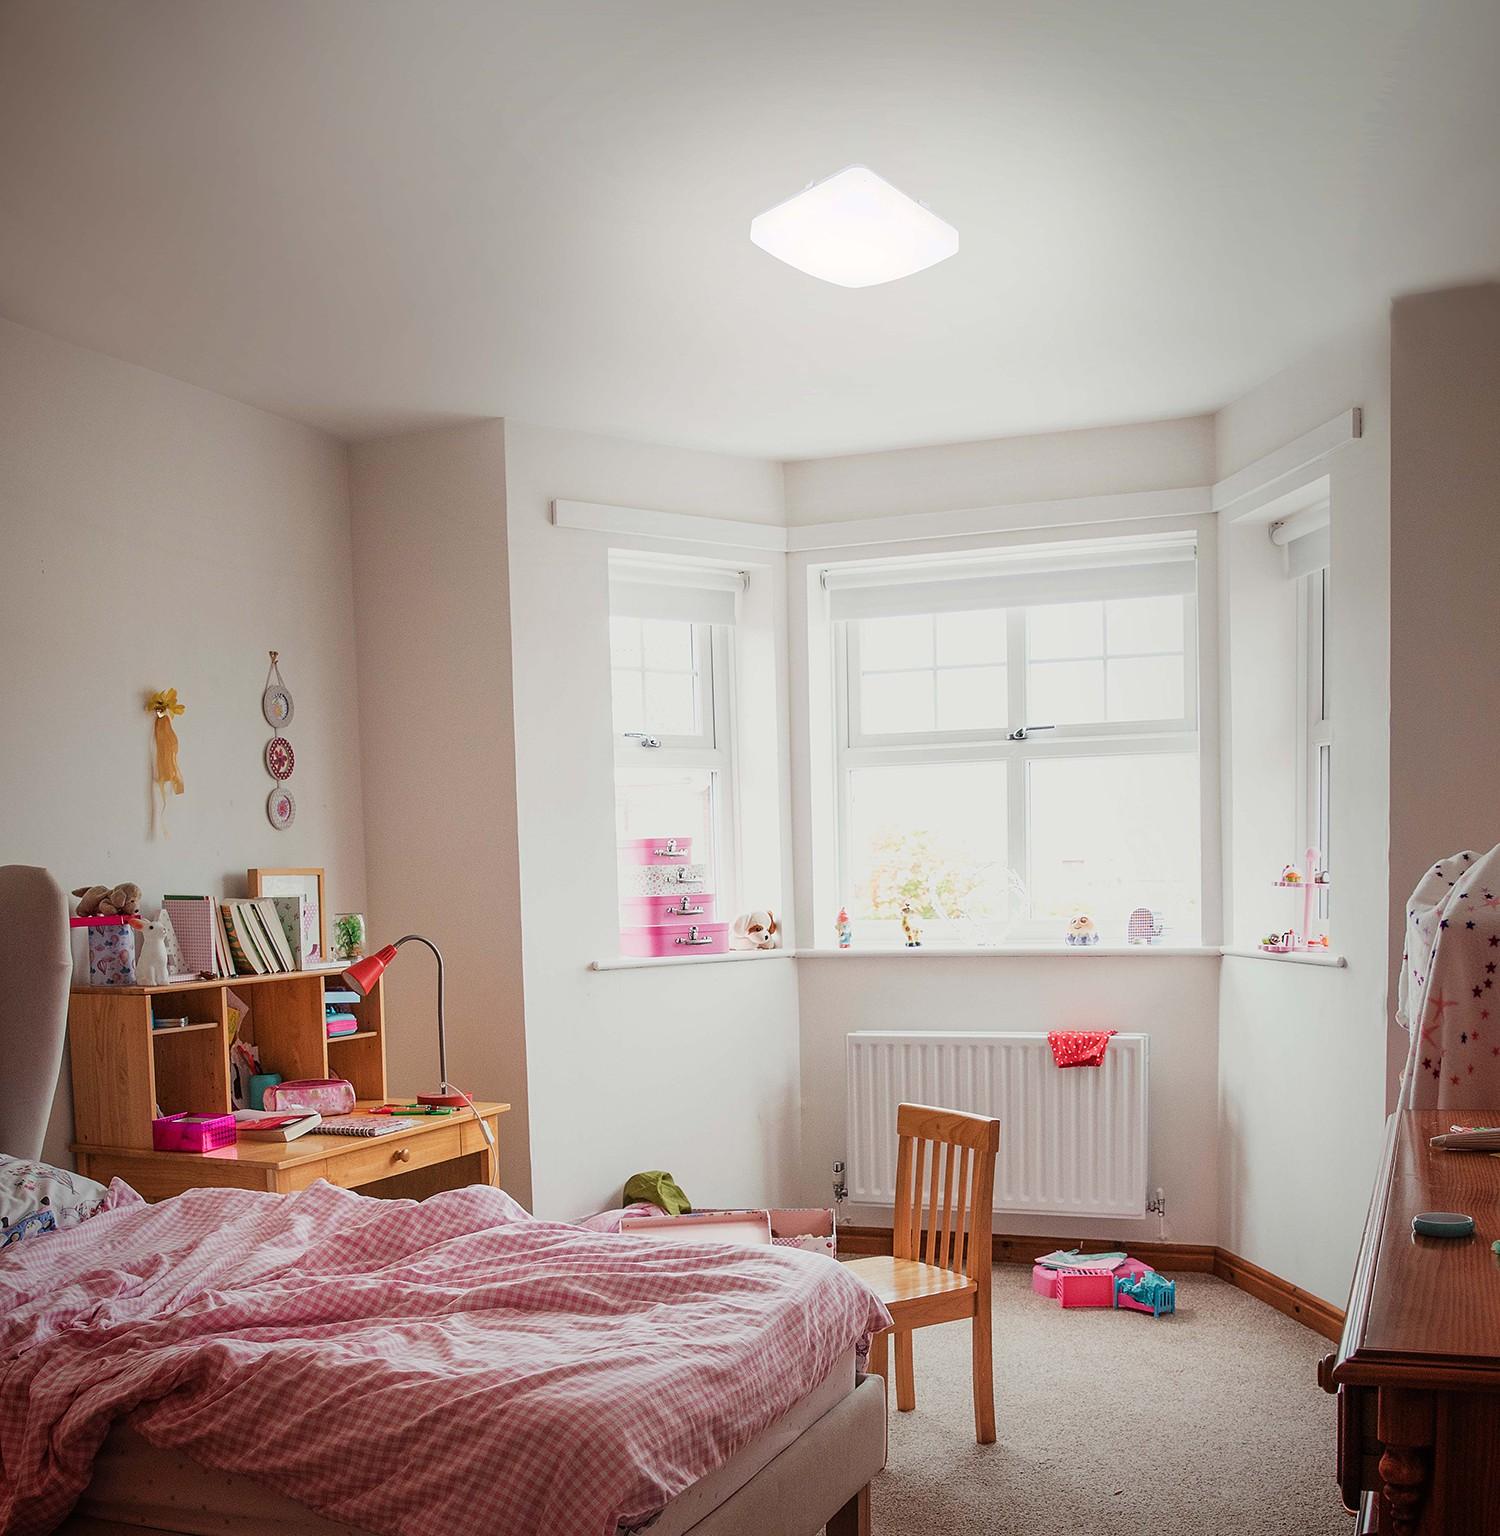 home24 LED-Deckenleuchte Marion